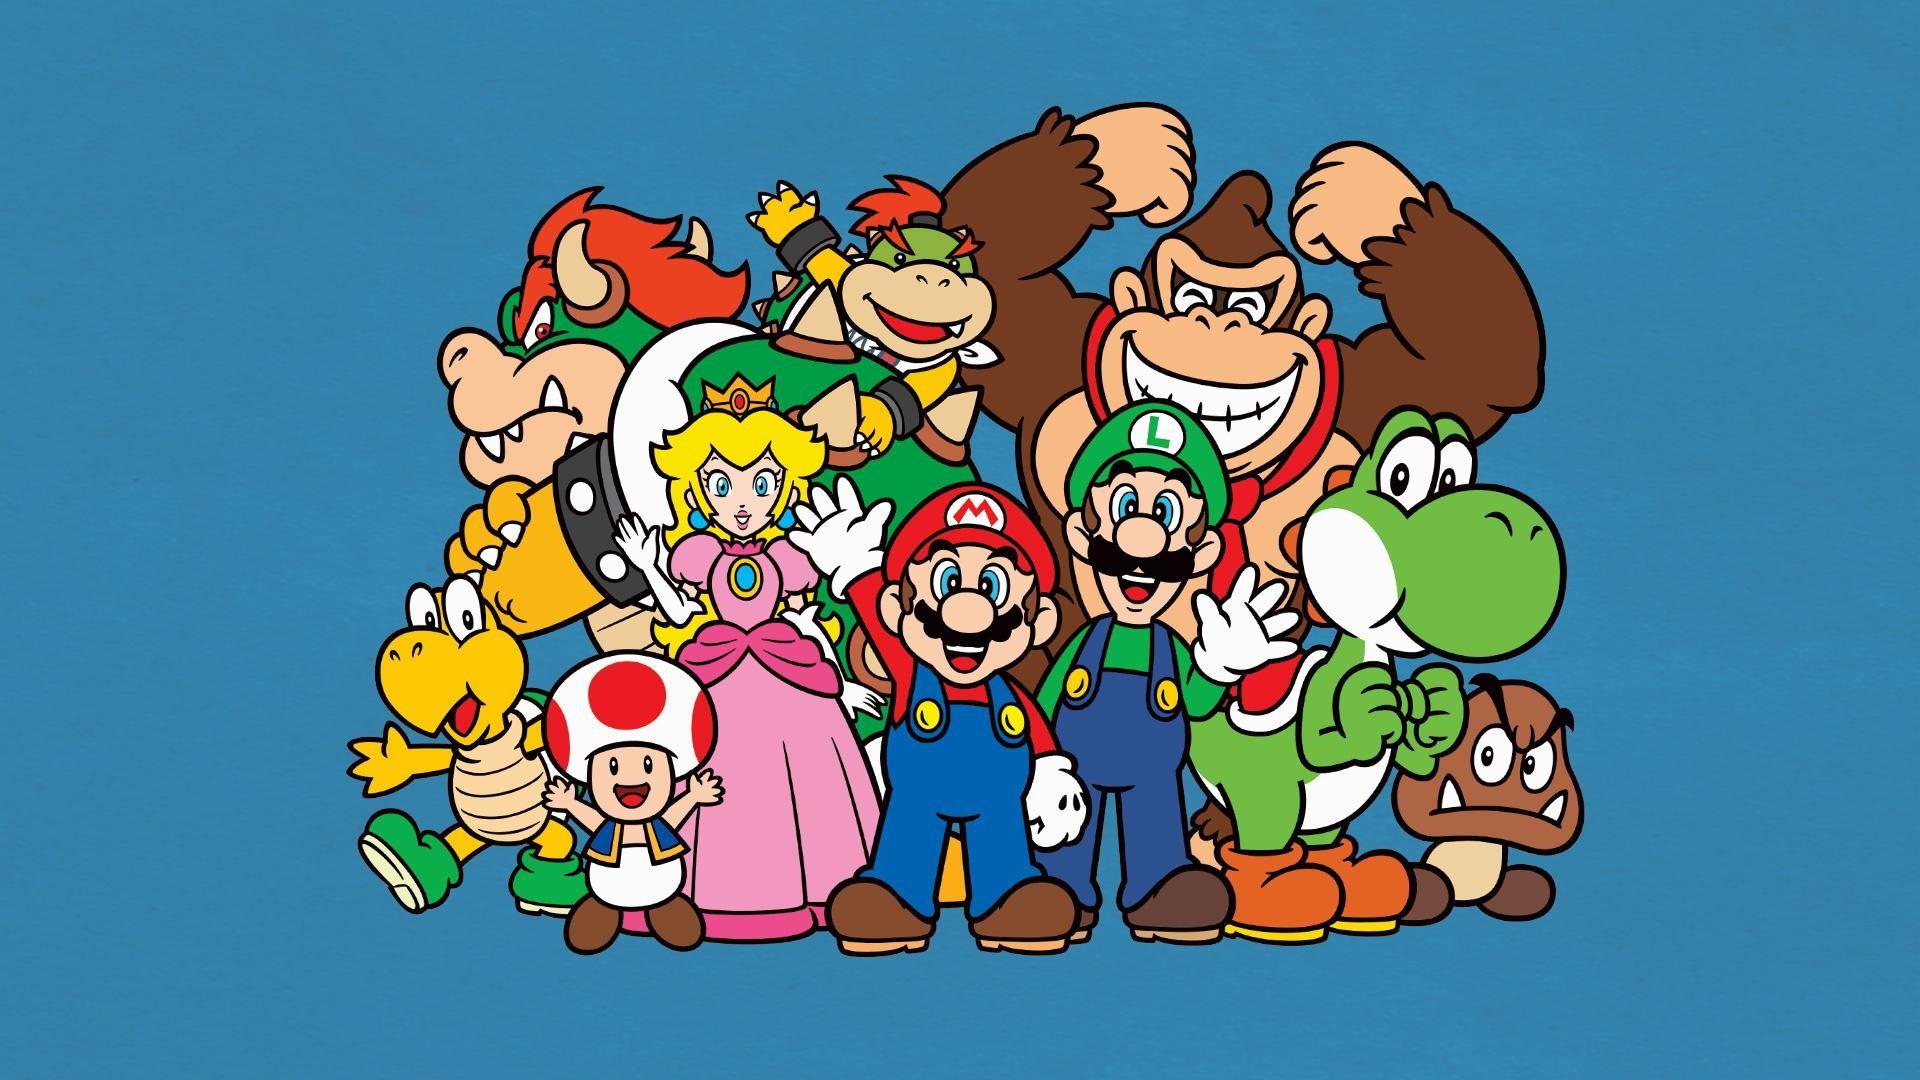 wallpaper.wiki-Nintendo-Backgrounds-Free-PIC-WPE002257